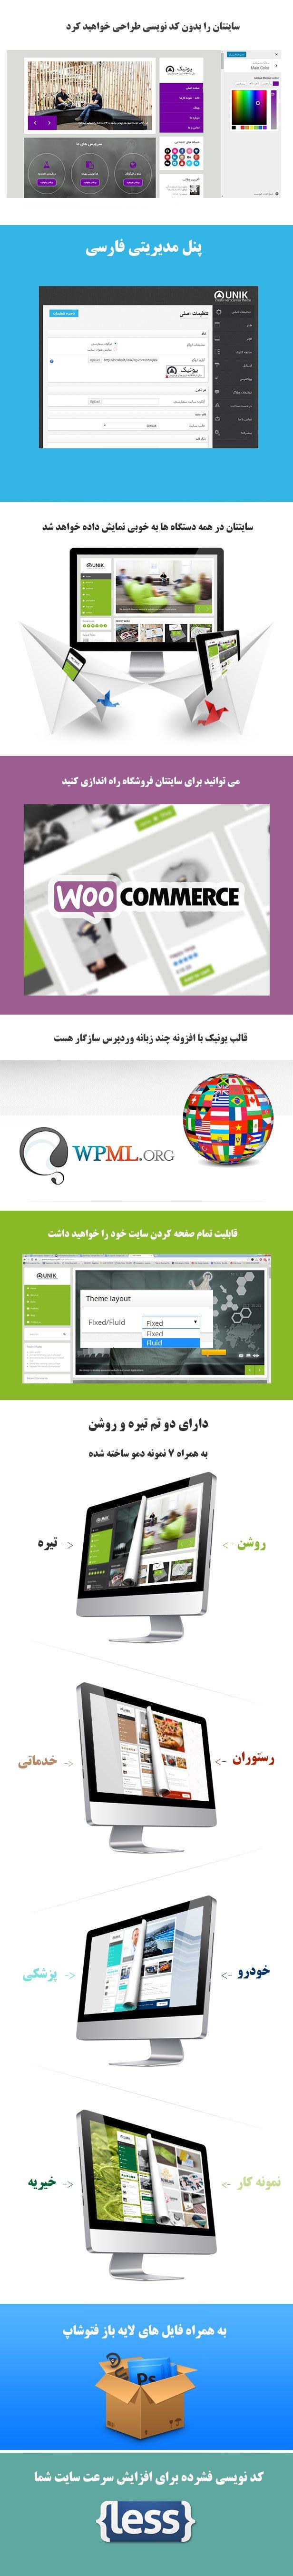 قالب وردپرس unik فارسی